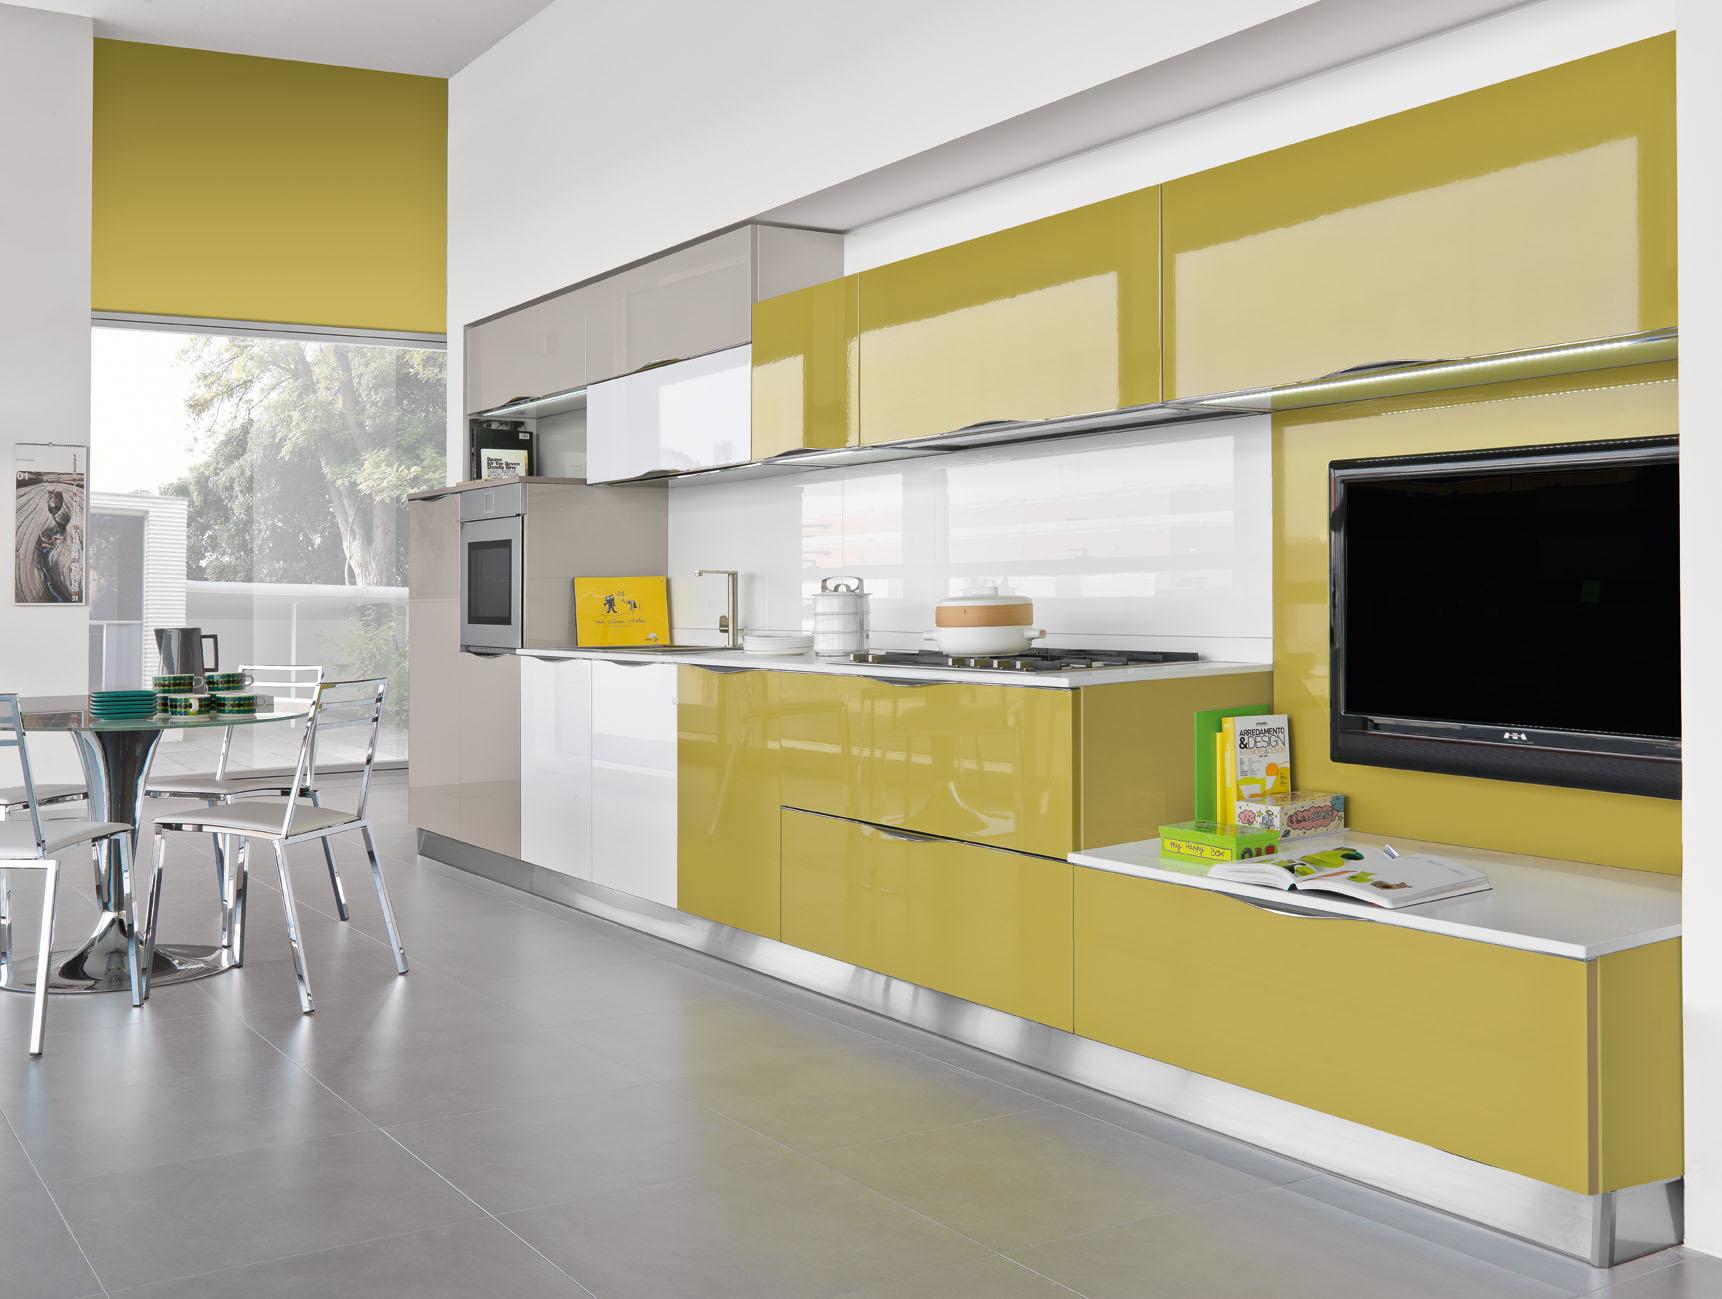 Ingrosso Cucine Moderne.Cucine Moderne Abitare Srl